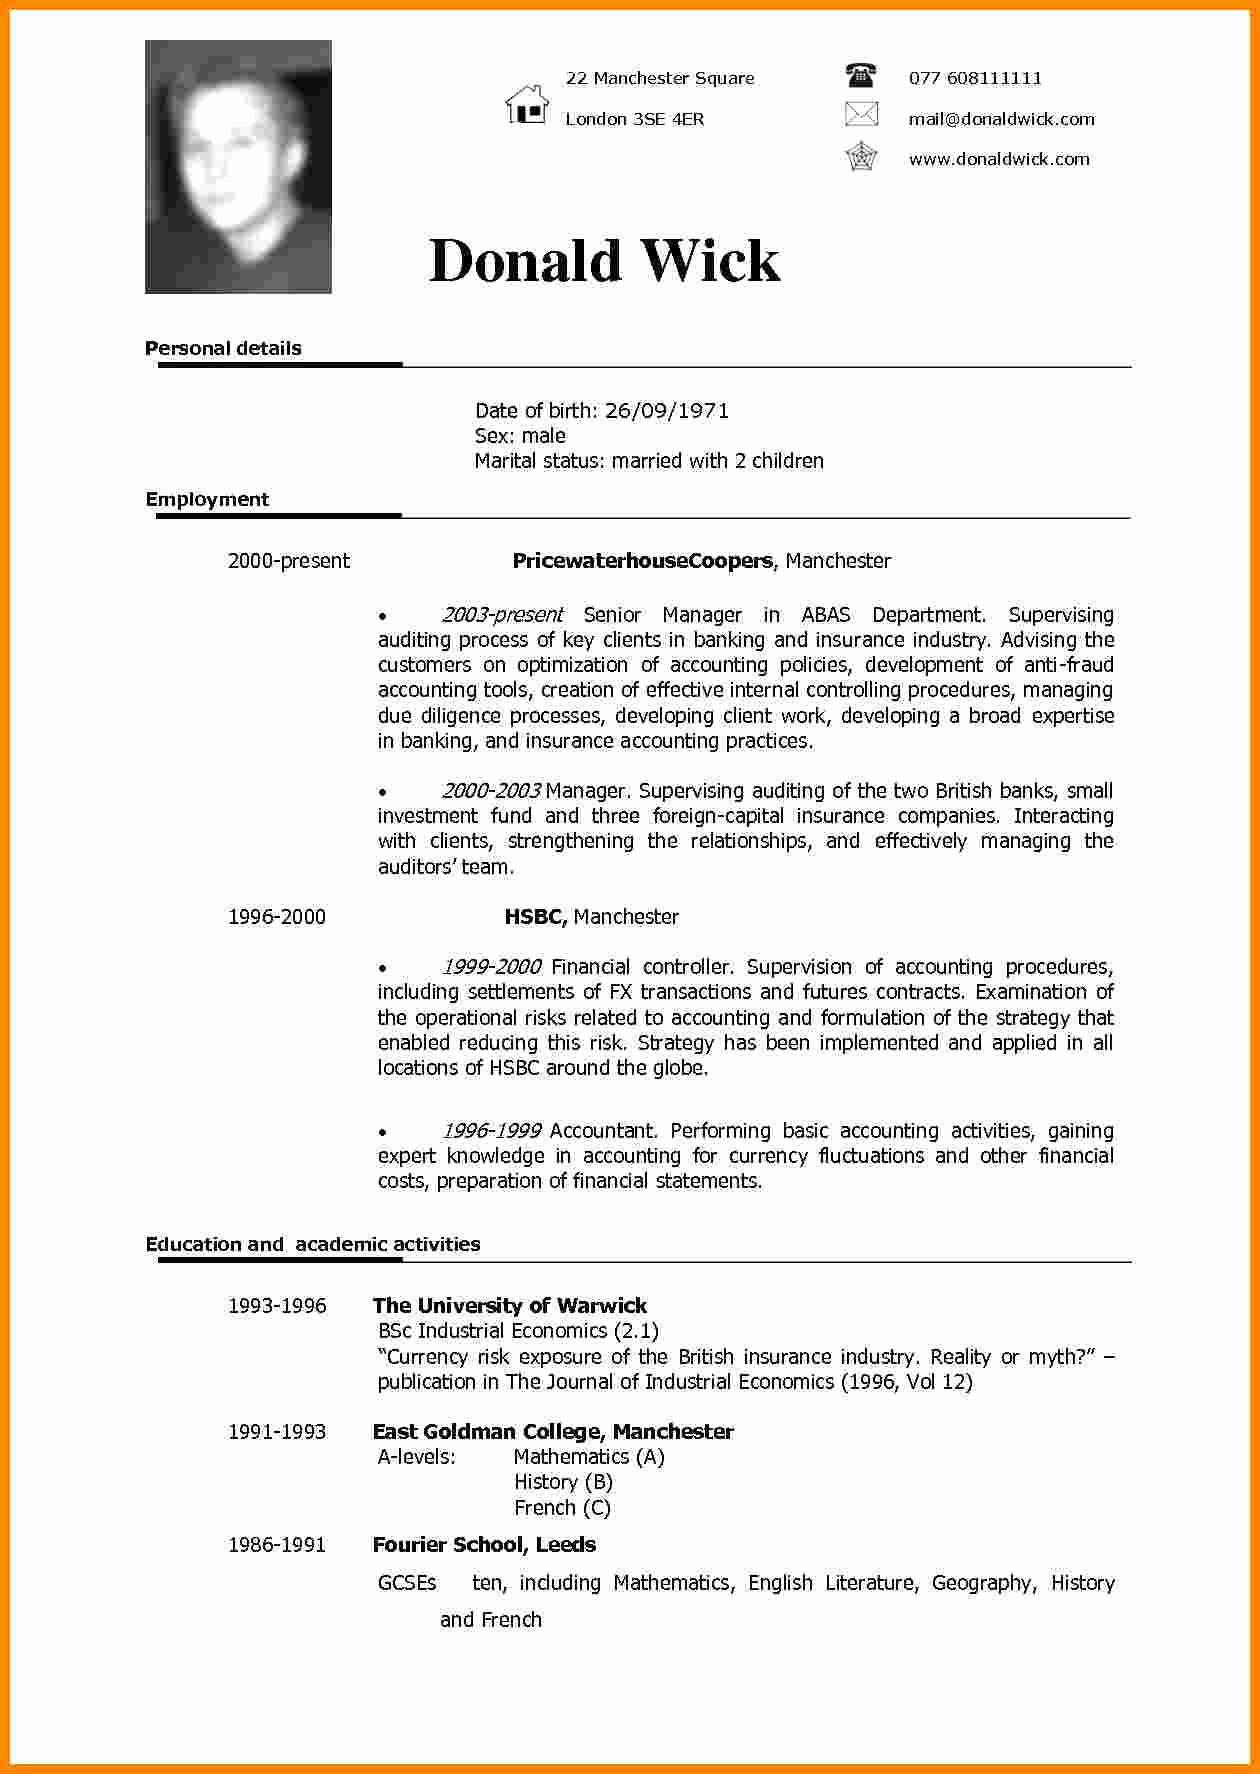 Curriculum Vitae Sample format Fresh 5 Cv Sample In English